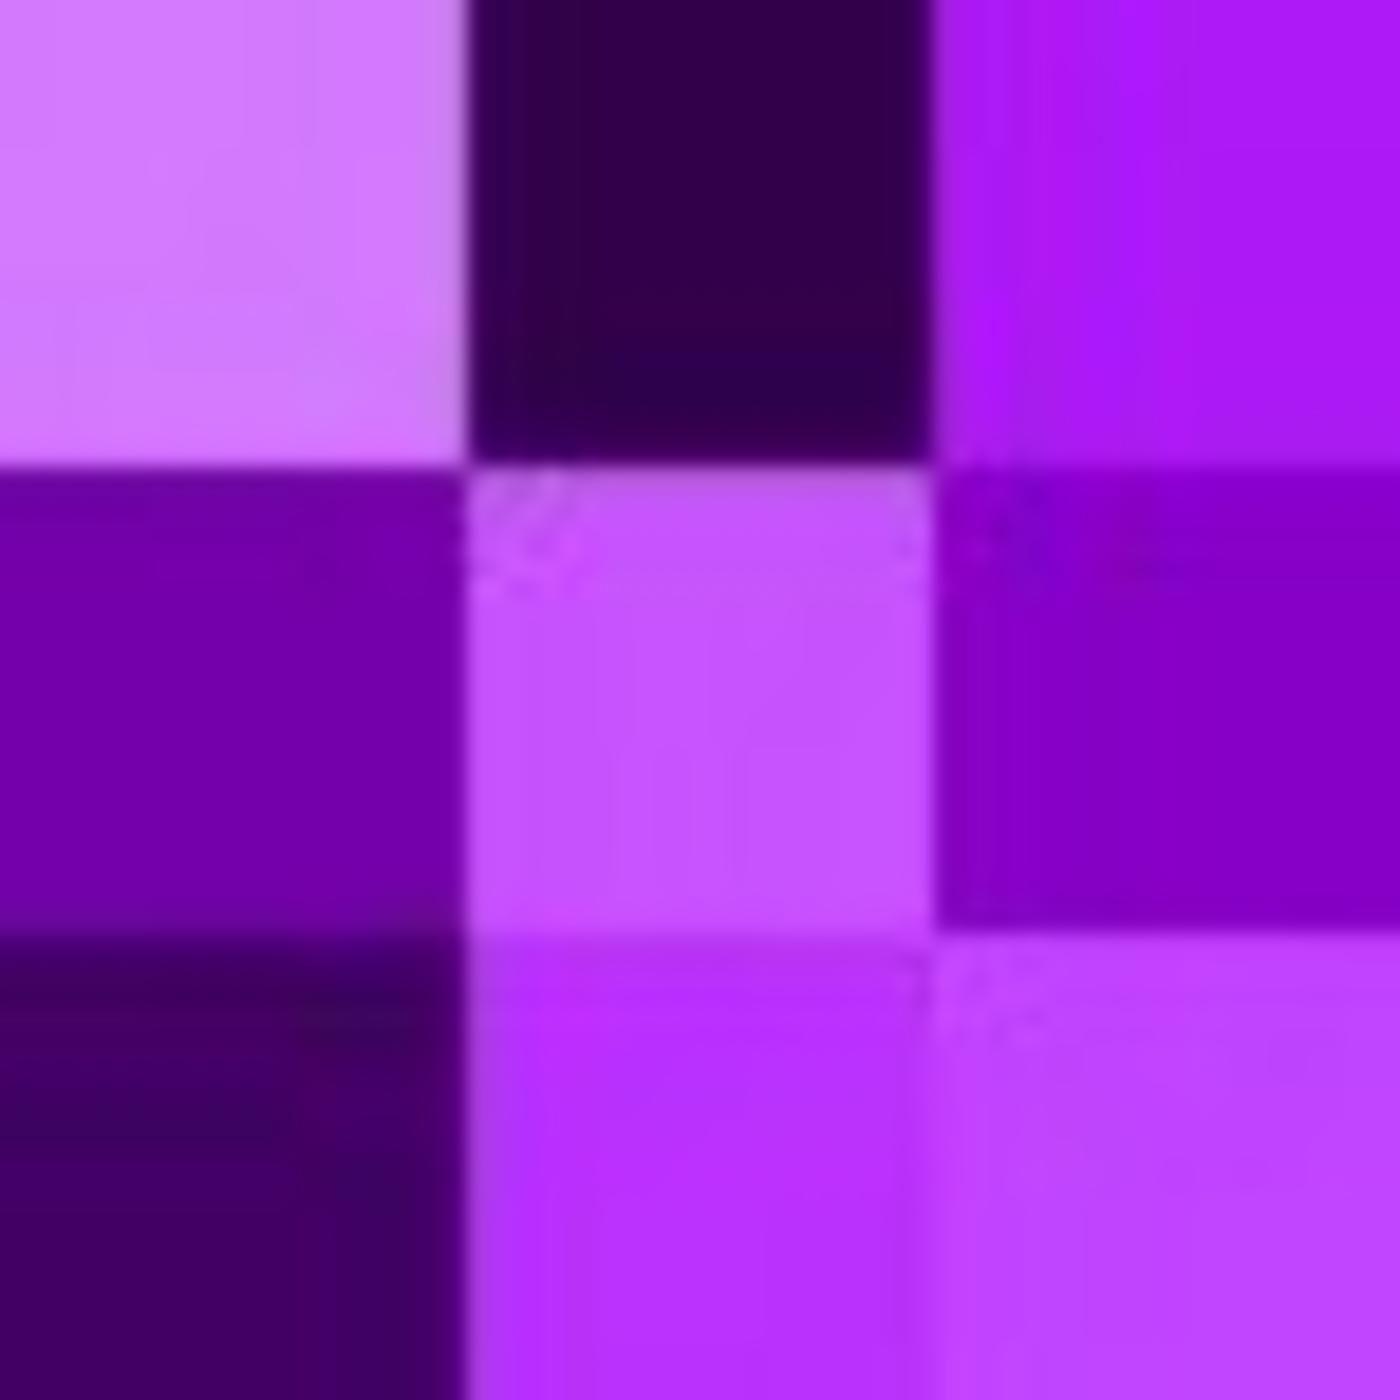 The Purple People Place Program